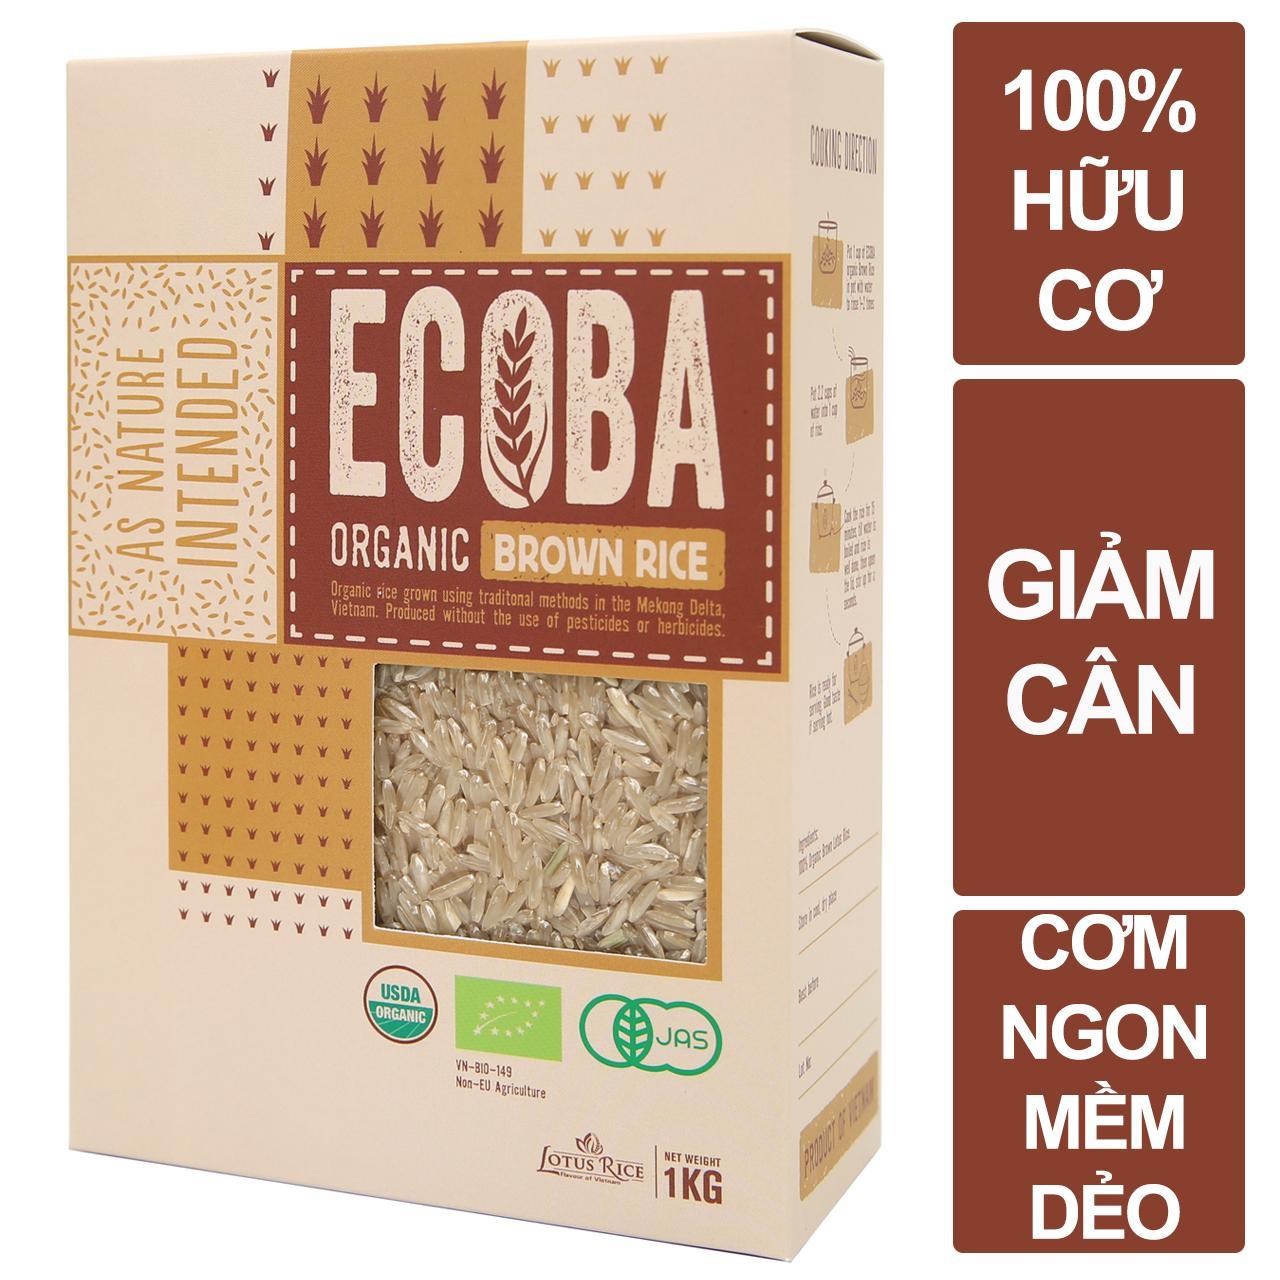 Gạo lứt giảm cân hữu cơ - ECOBA Kim Mễ 1kg - Cơm ngon mềm dẻo